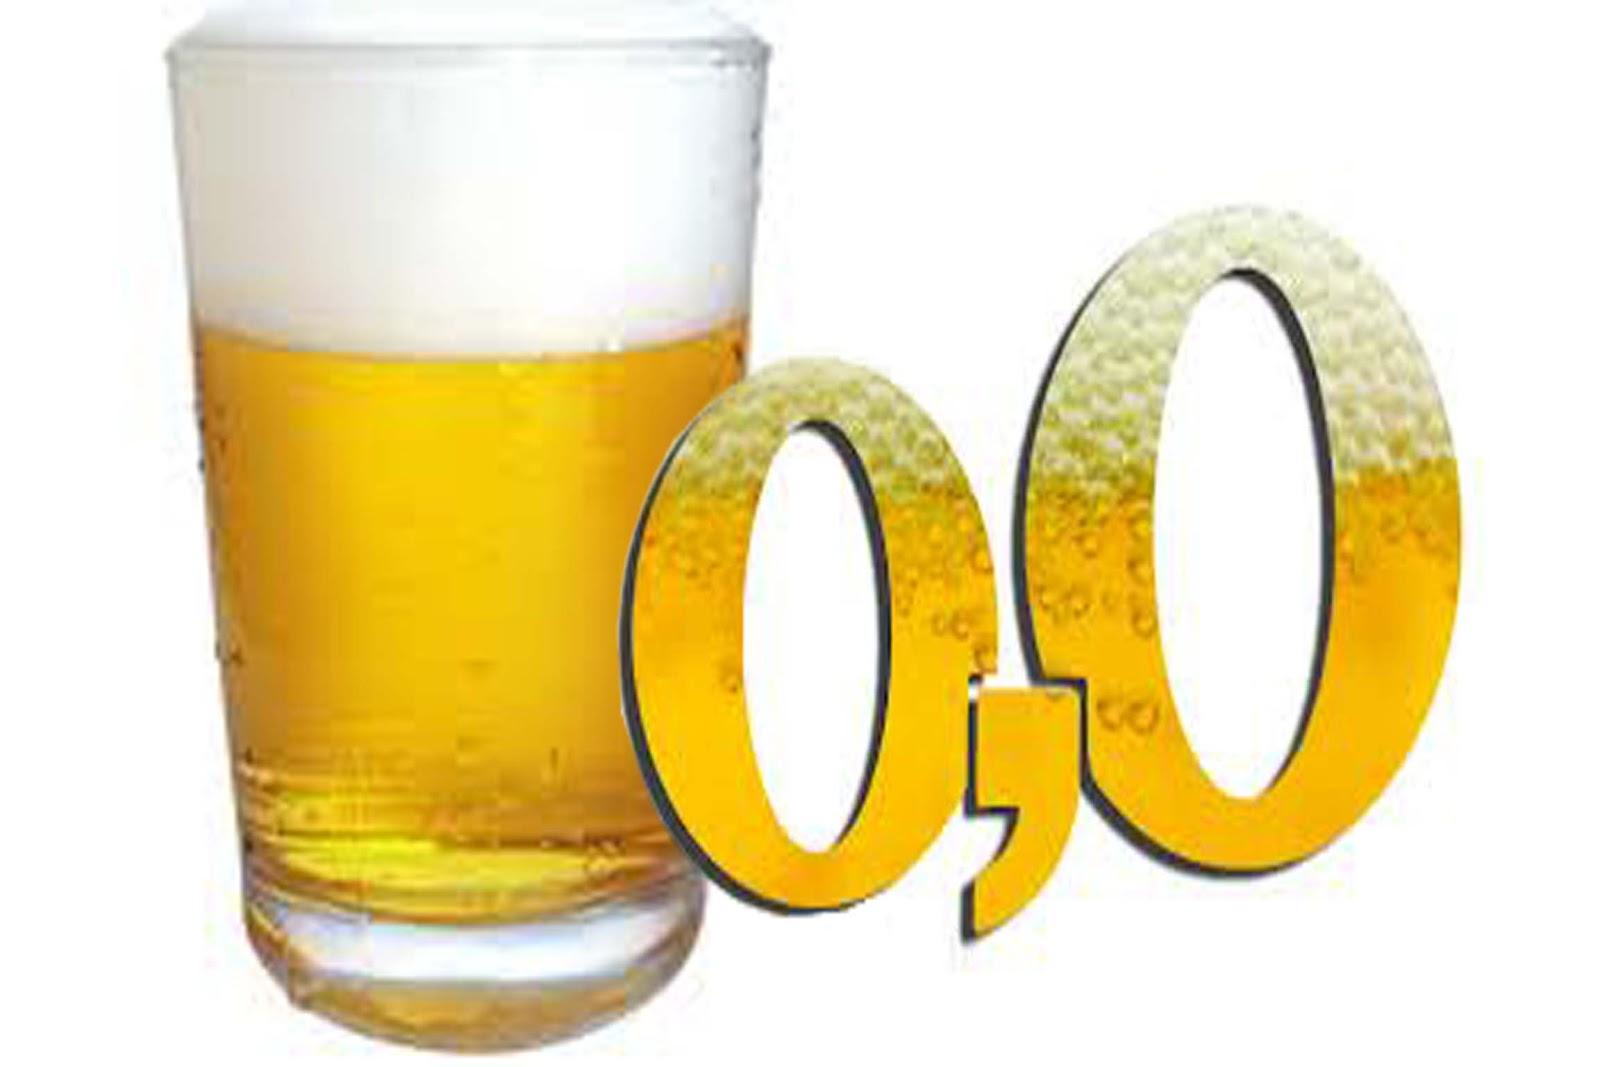 Cerveza, 10 razones para tomarla